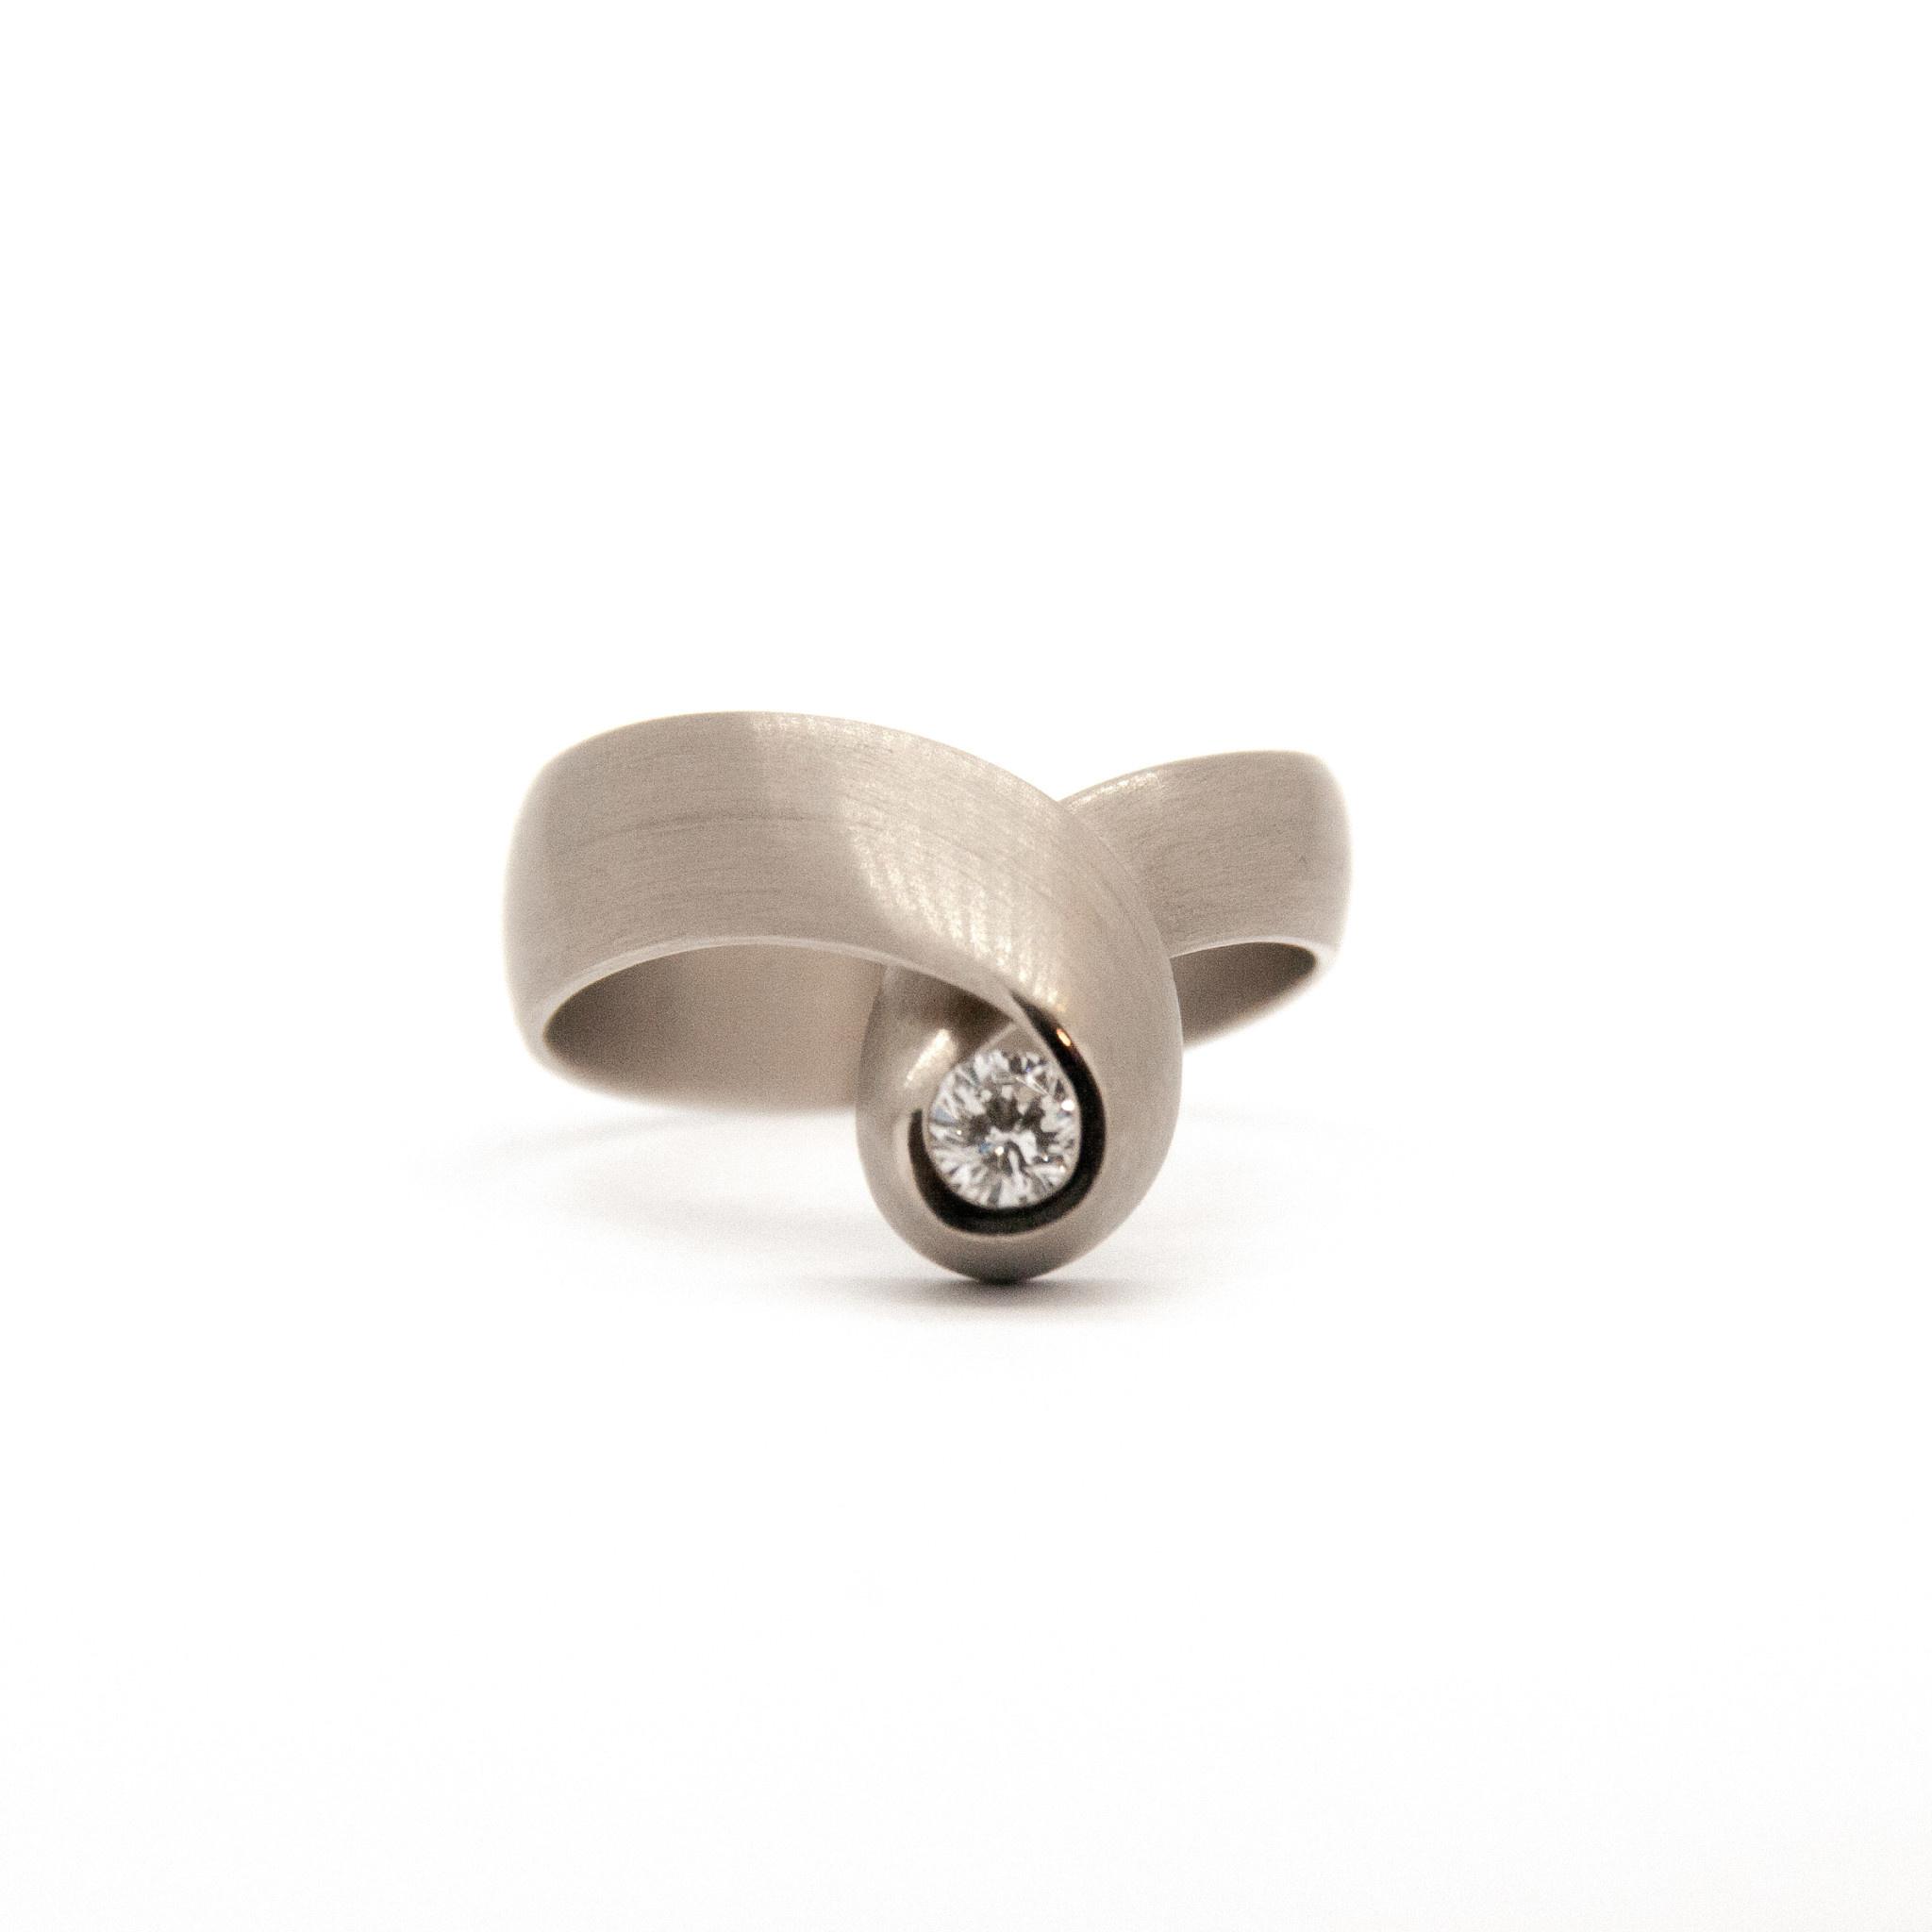 14k white gold ring size 56-1